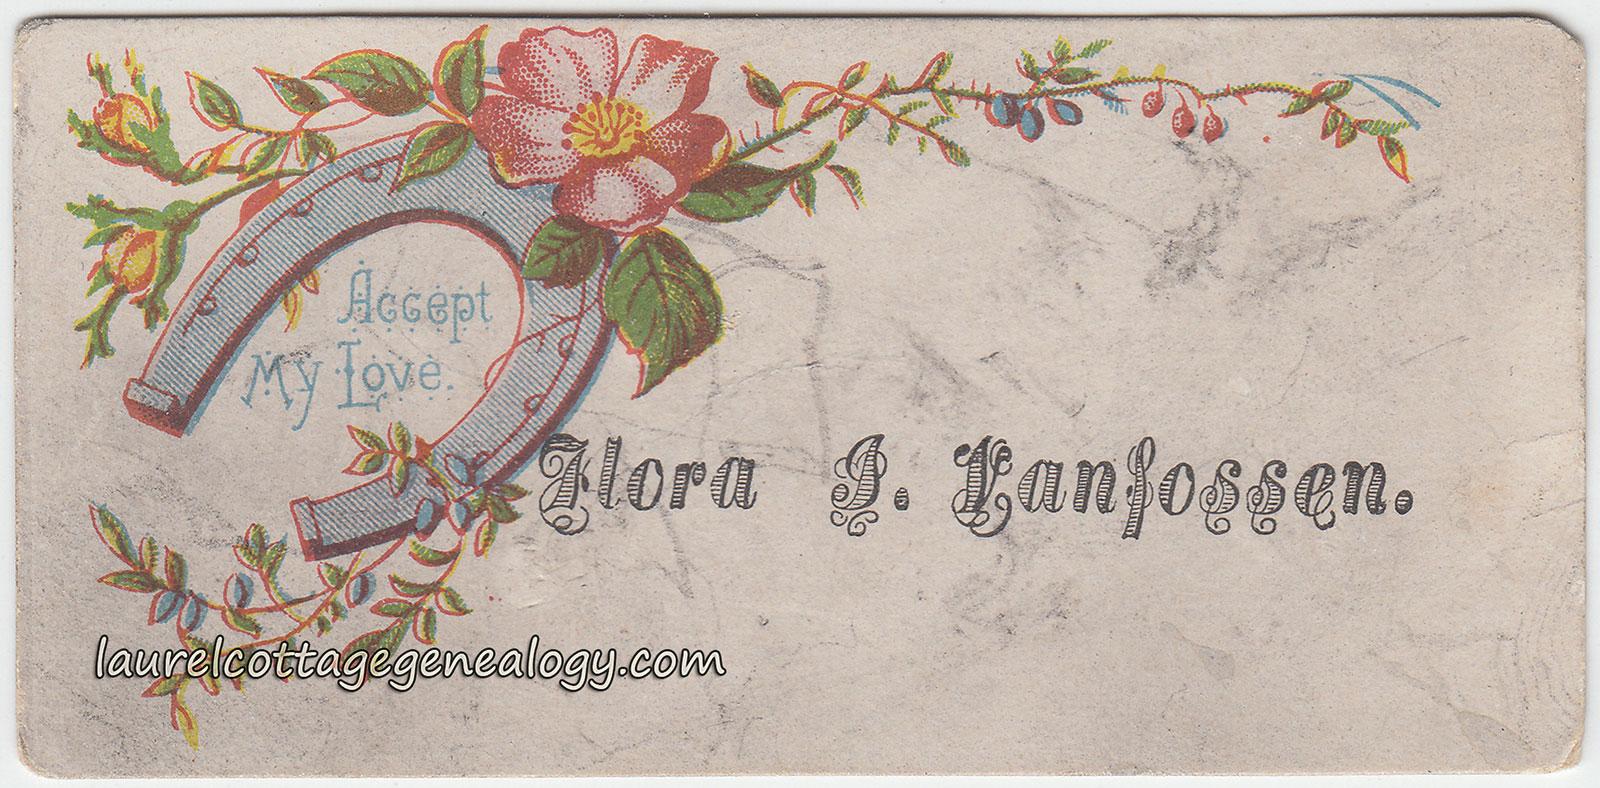 Calling Cards and Business Cards | Laurel Cottage Genealogy